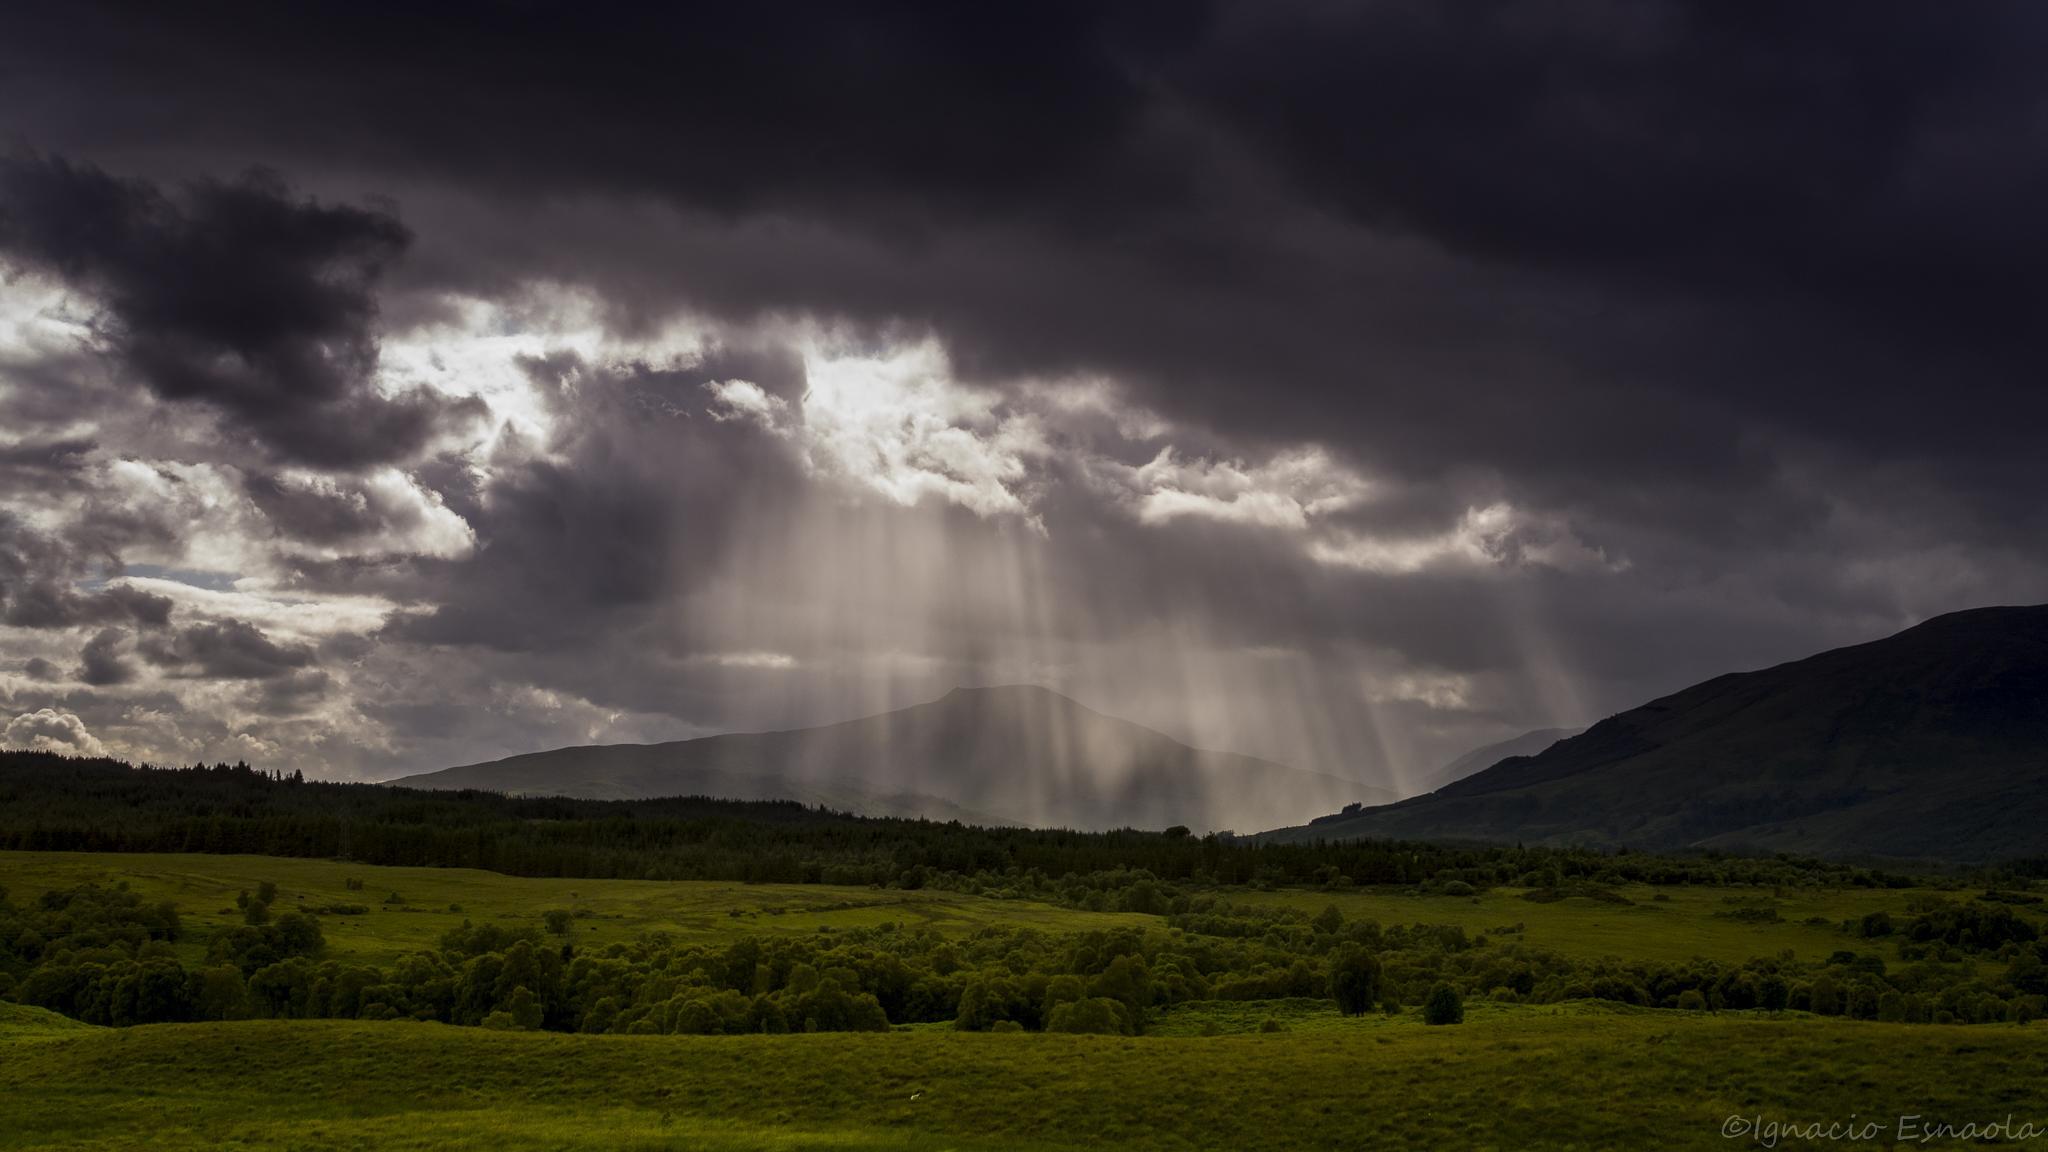 Magic sun by Ignacio Esnaola